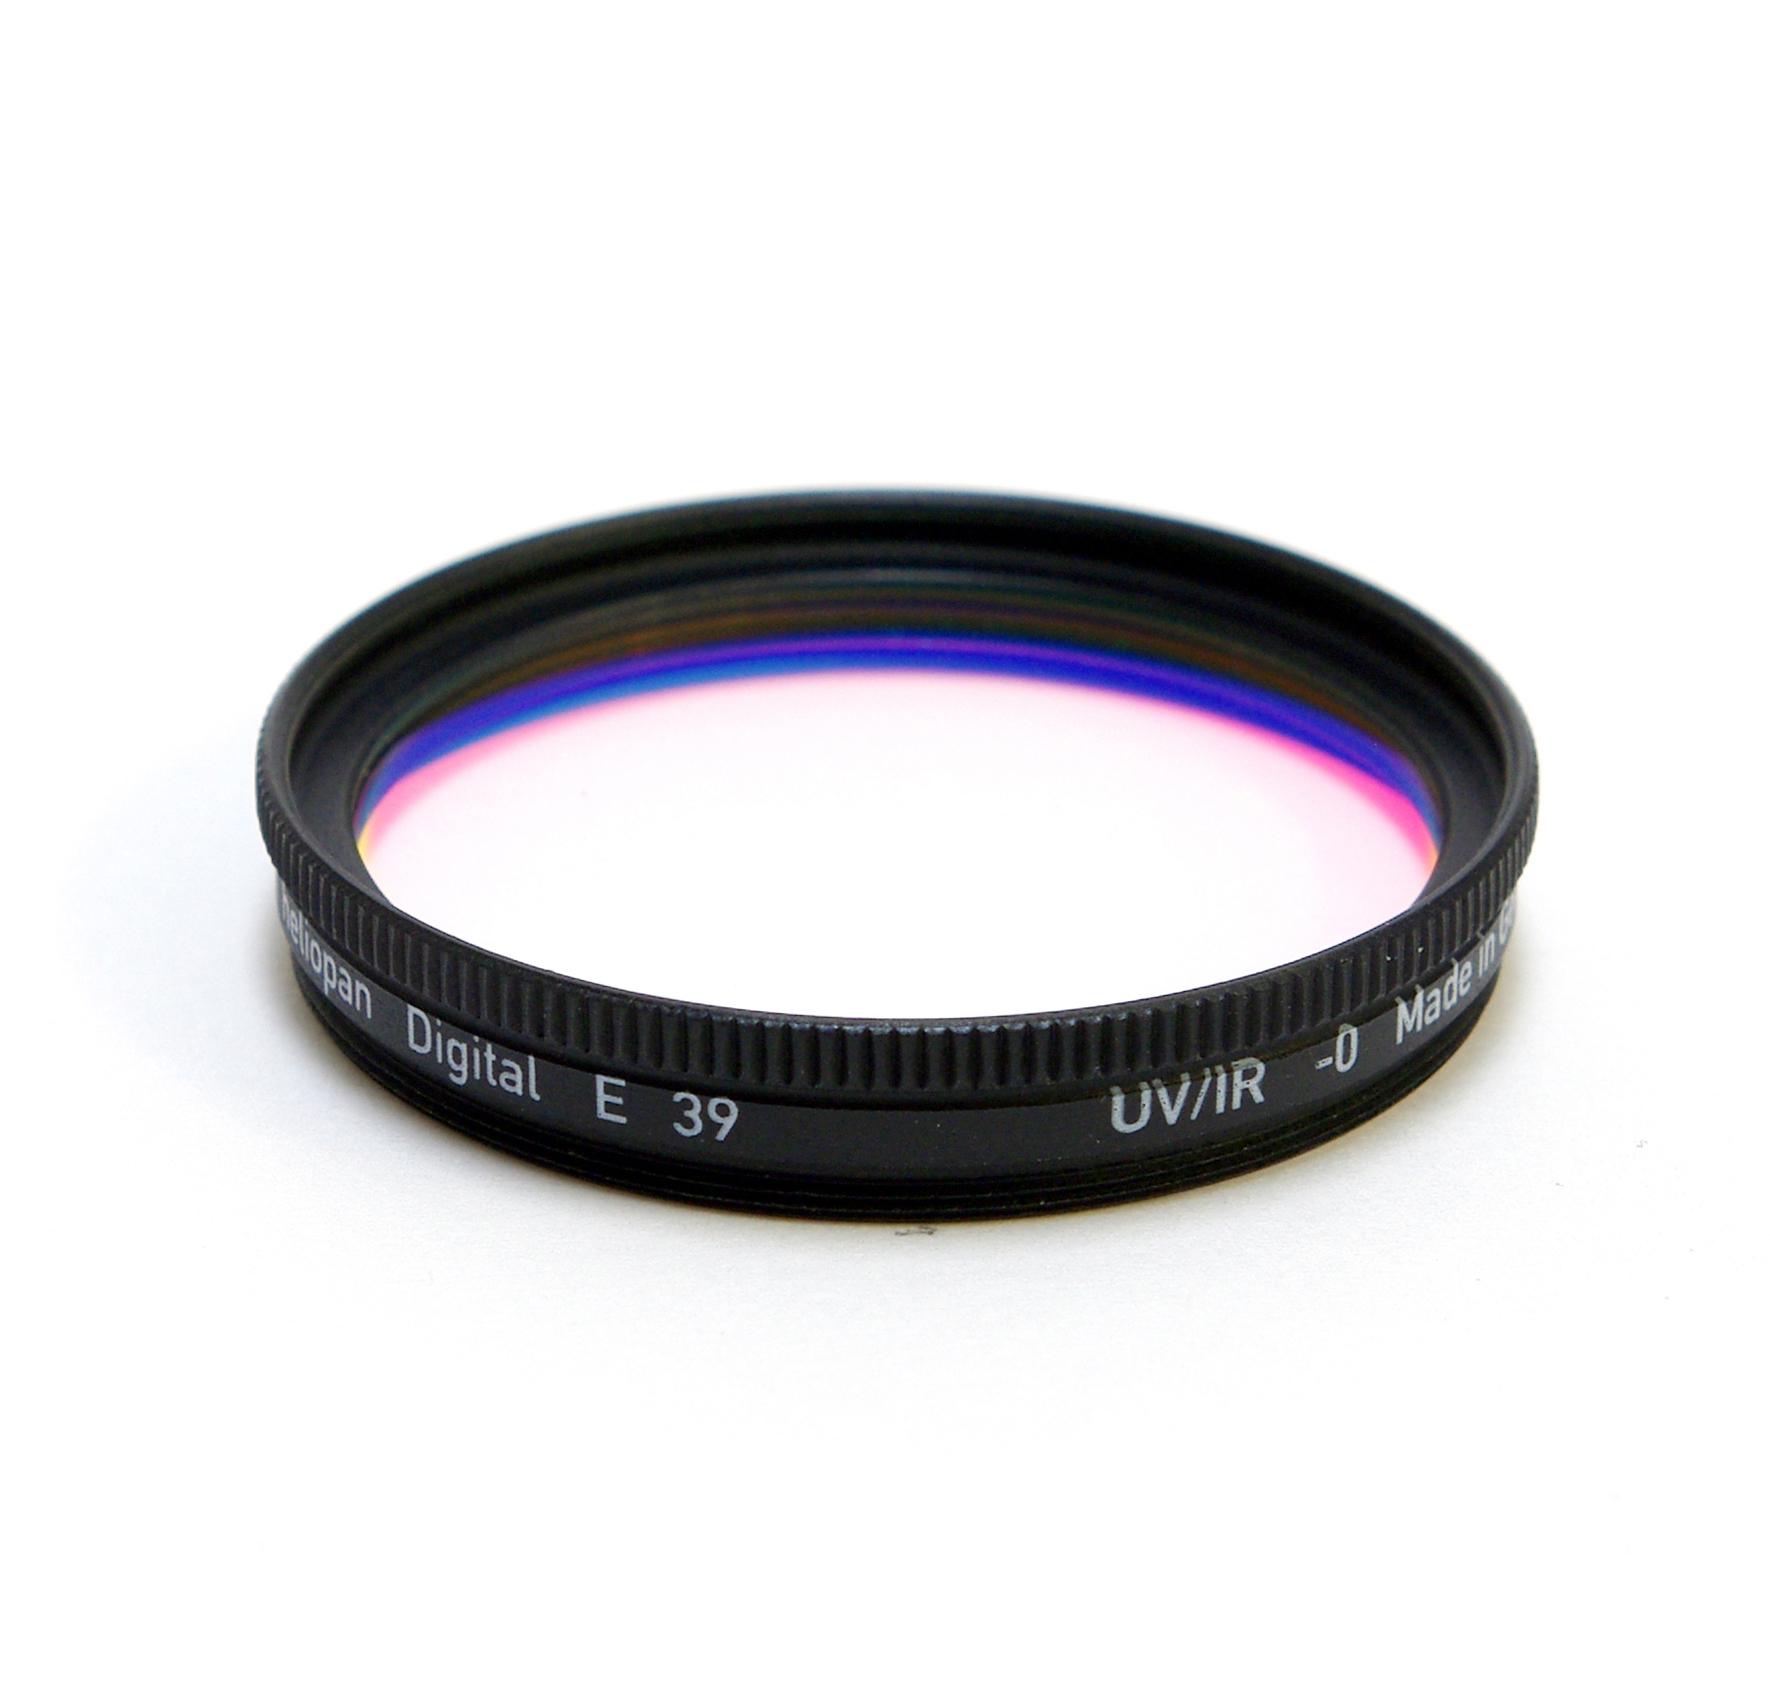 Heliopan digital uv filters